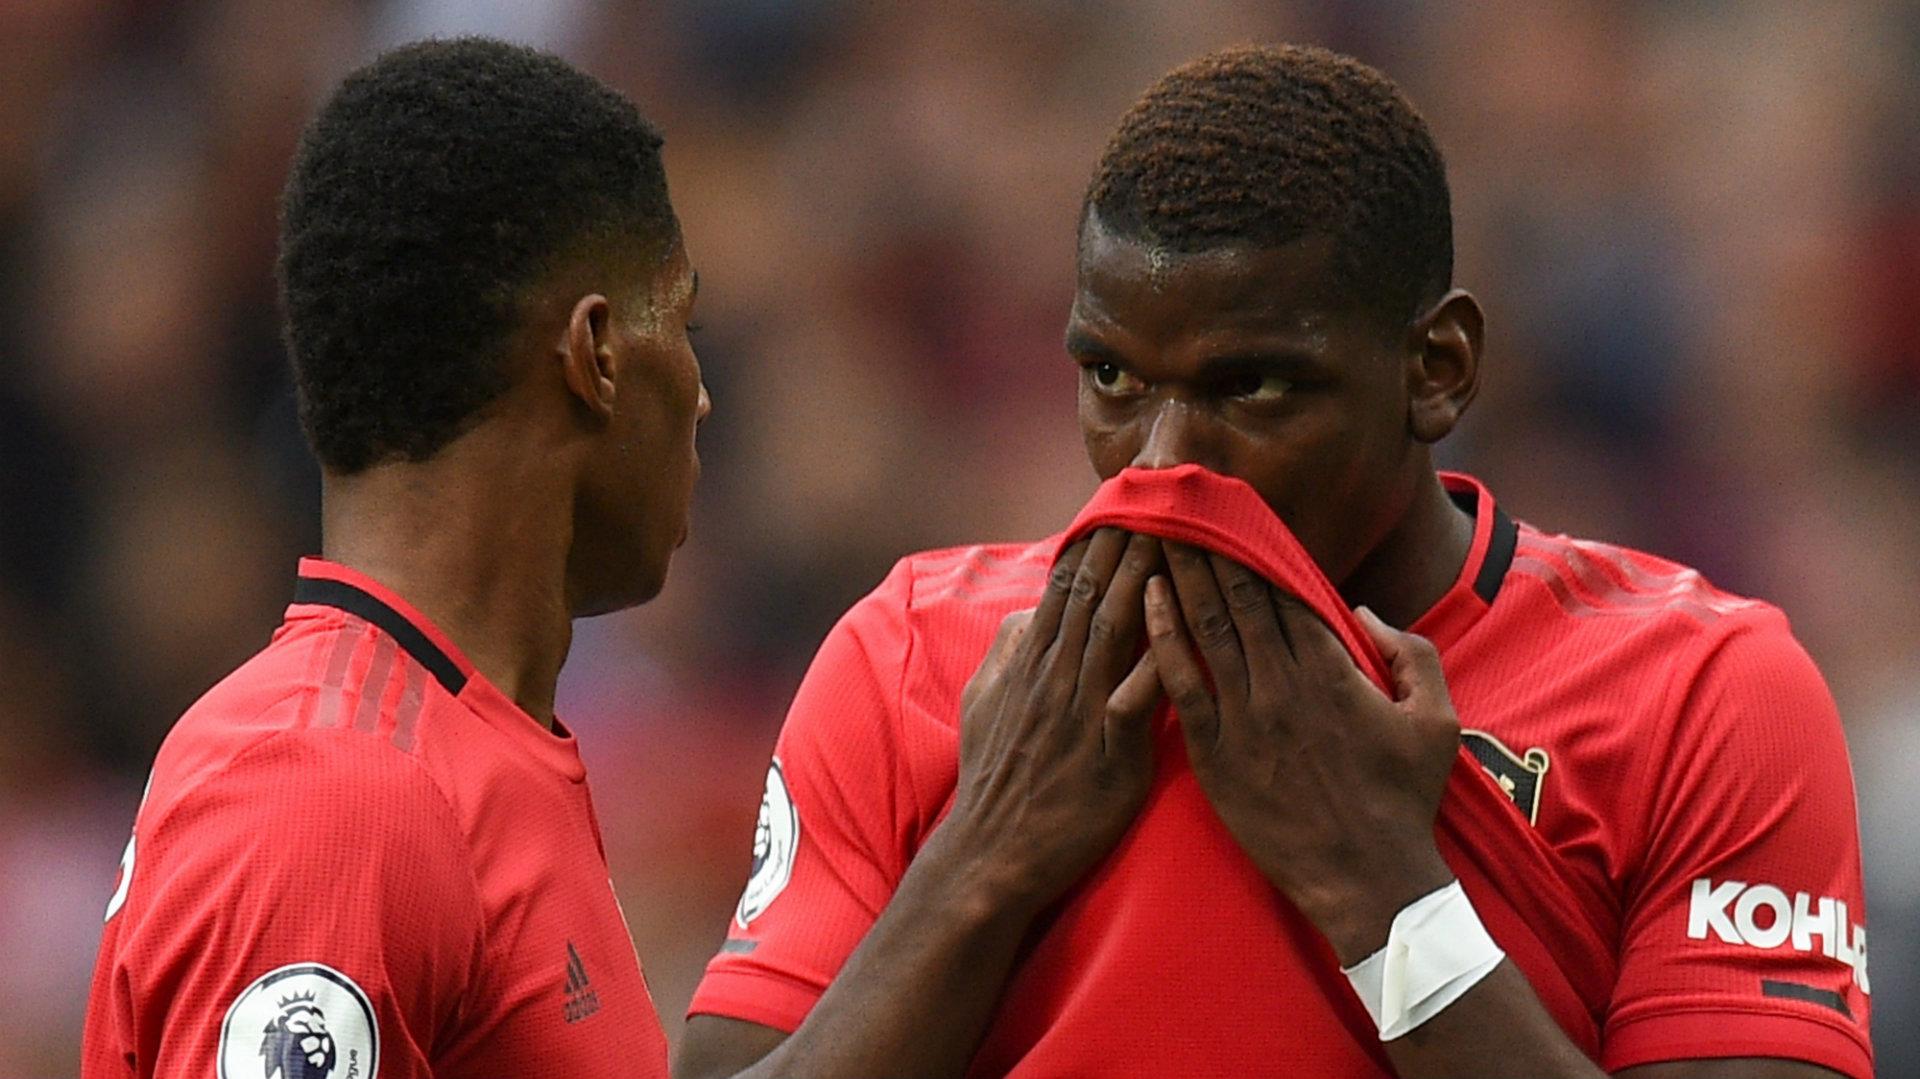 Bolt urges Man Utd to build team around Pogba & Rashford to return to the top